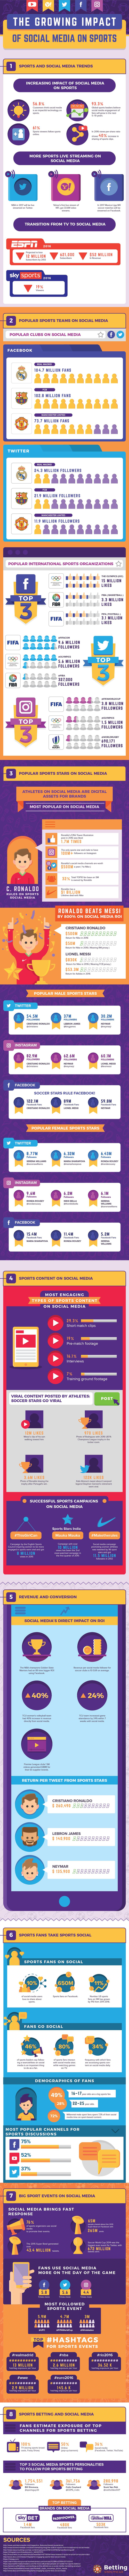 Infographic-increasing-sport-socialmedia.png